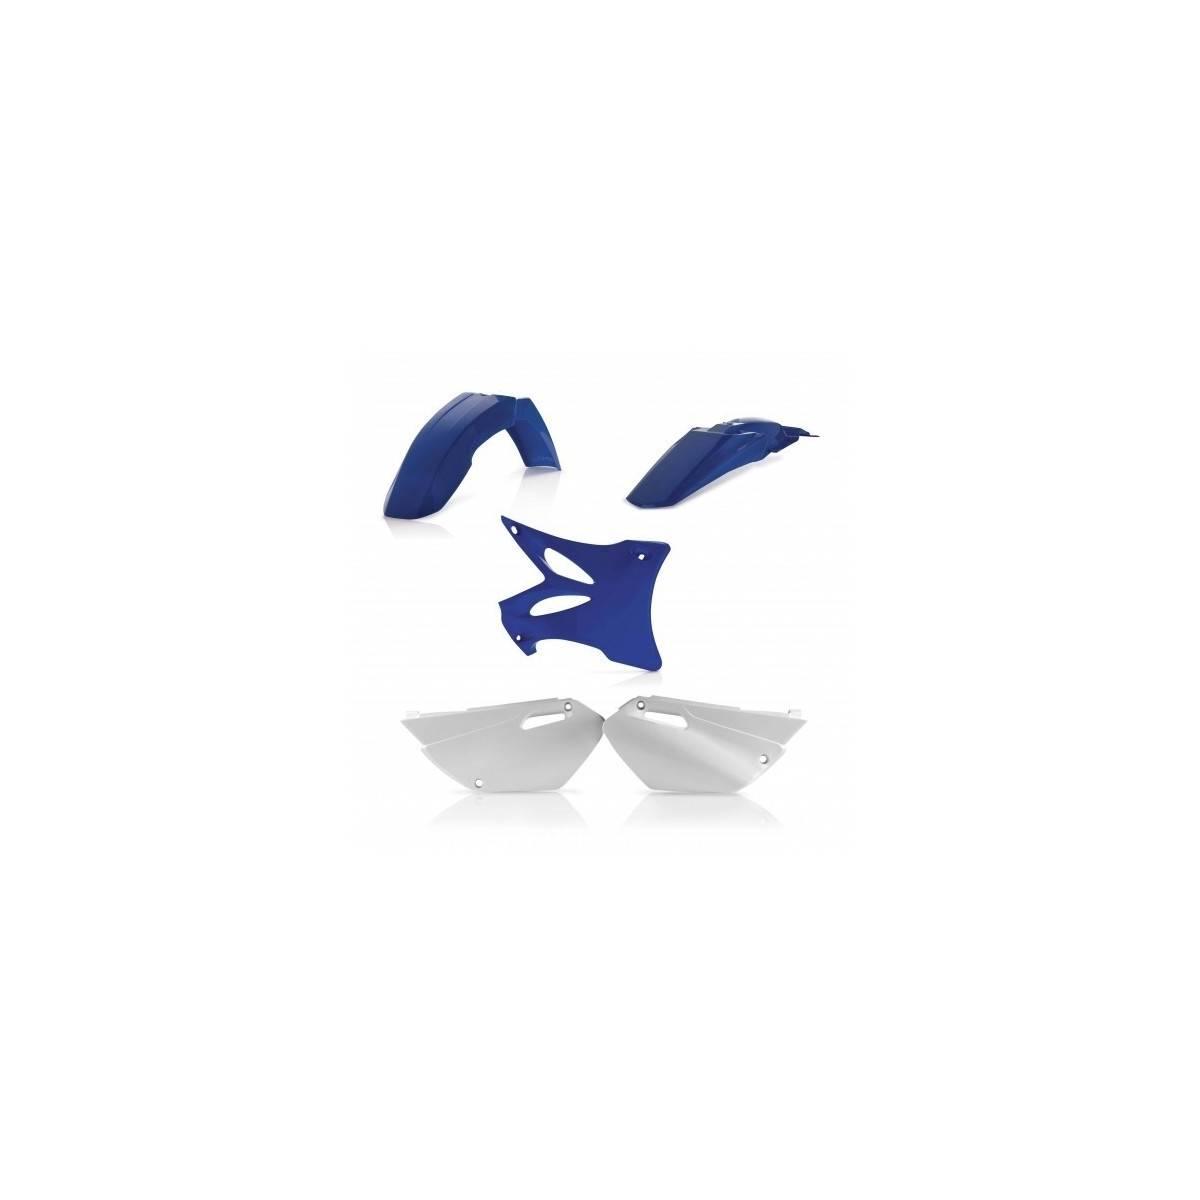 0021749-040 - Kit Plasticos Wrf 250 15 17 Wrf 450 16 17 Azul